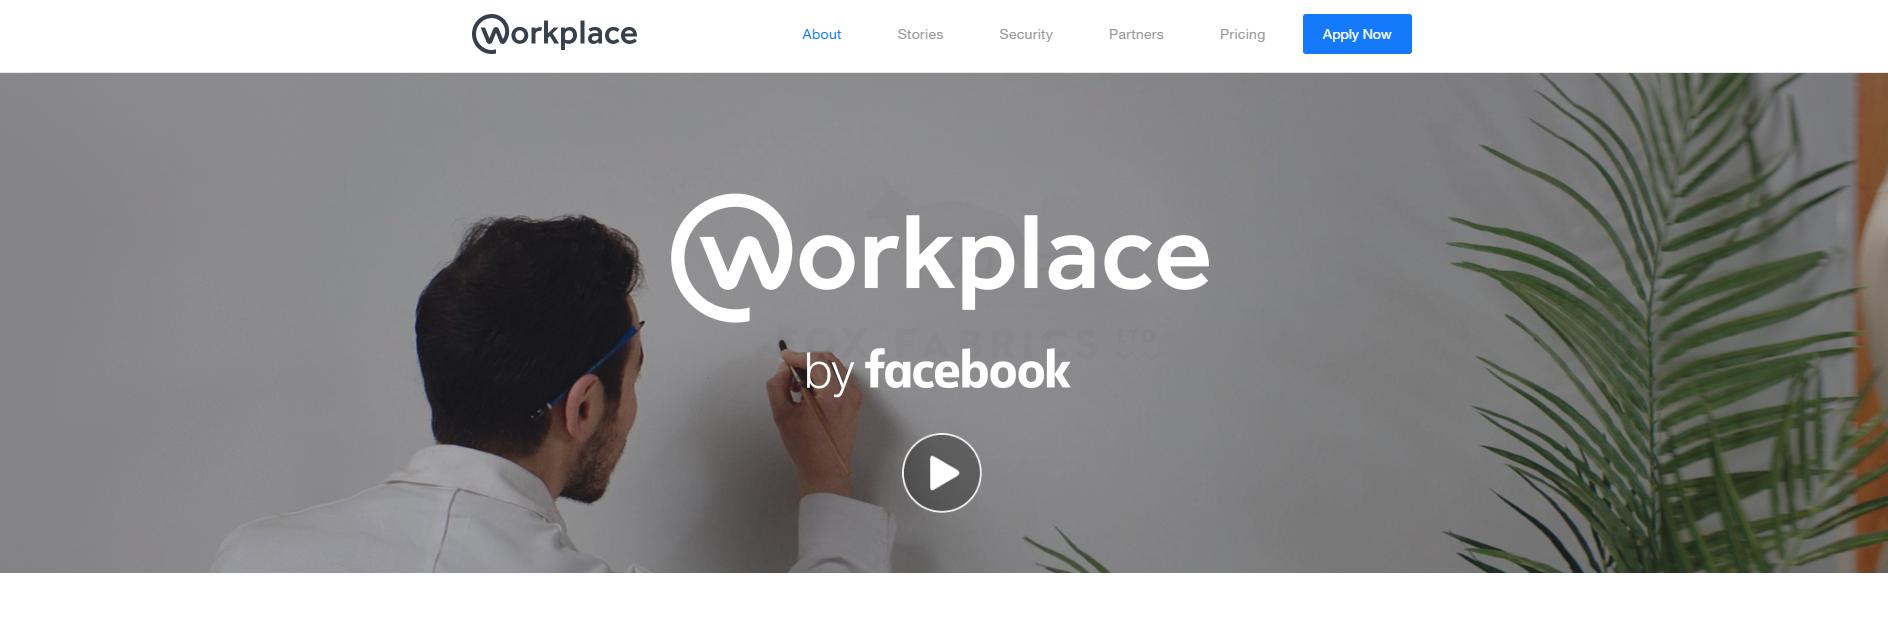 fb-workplace